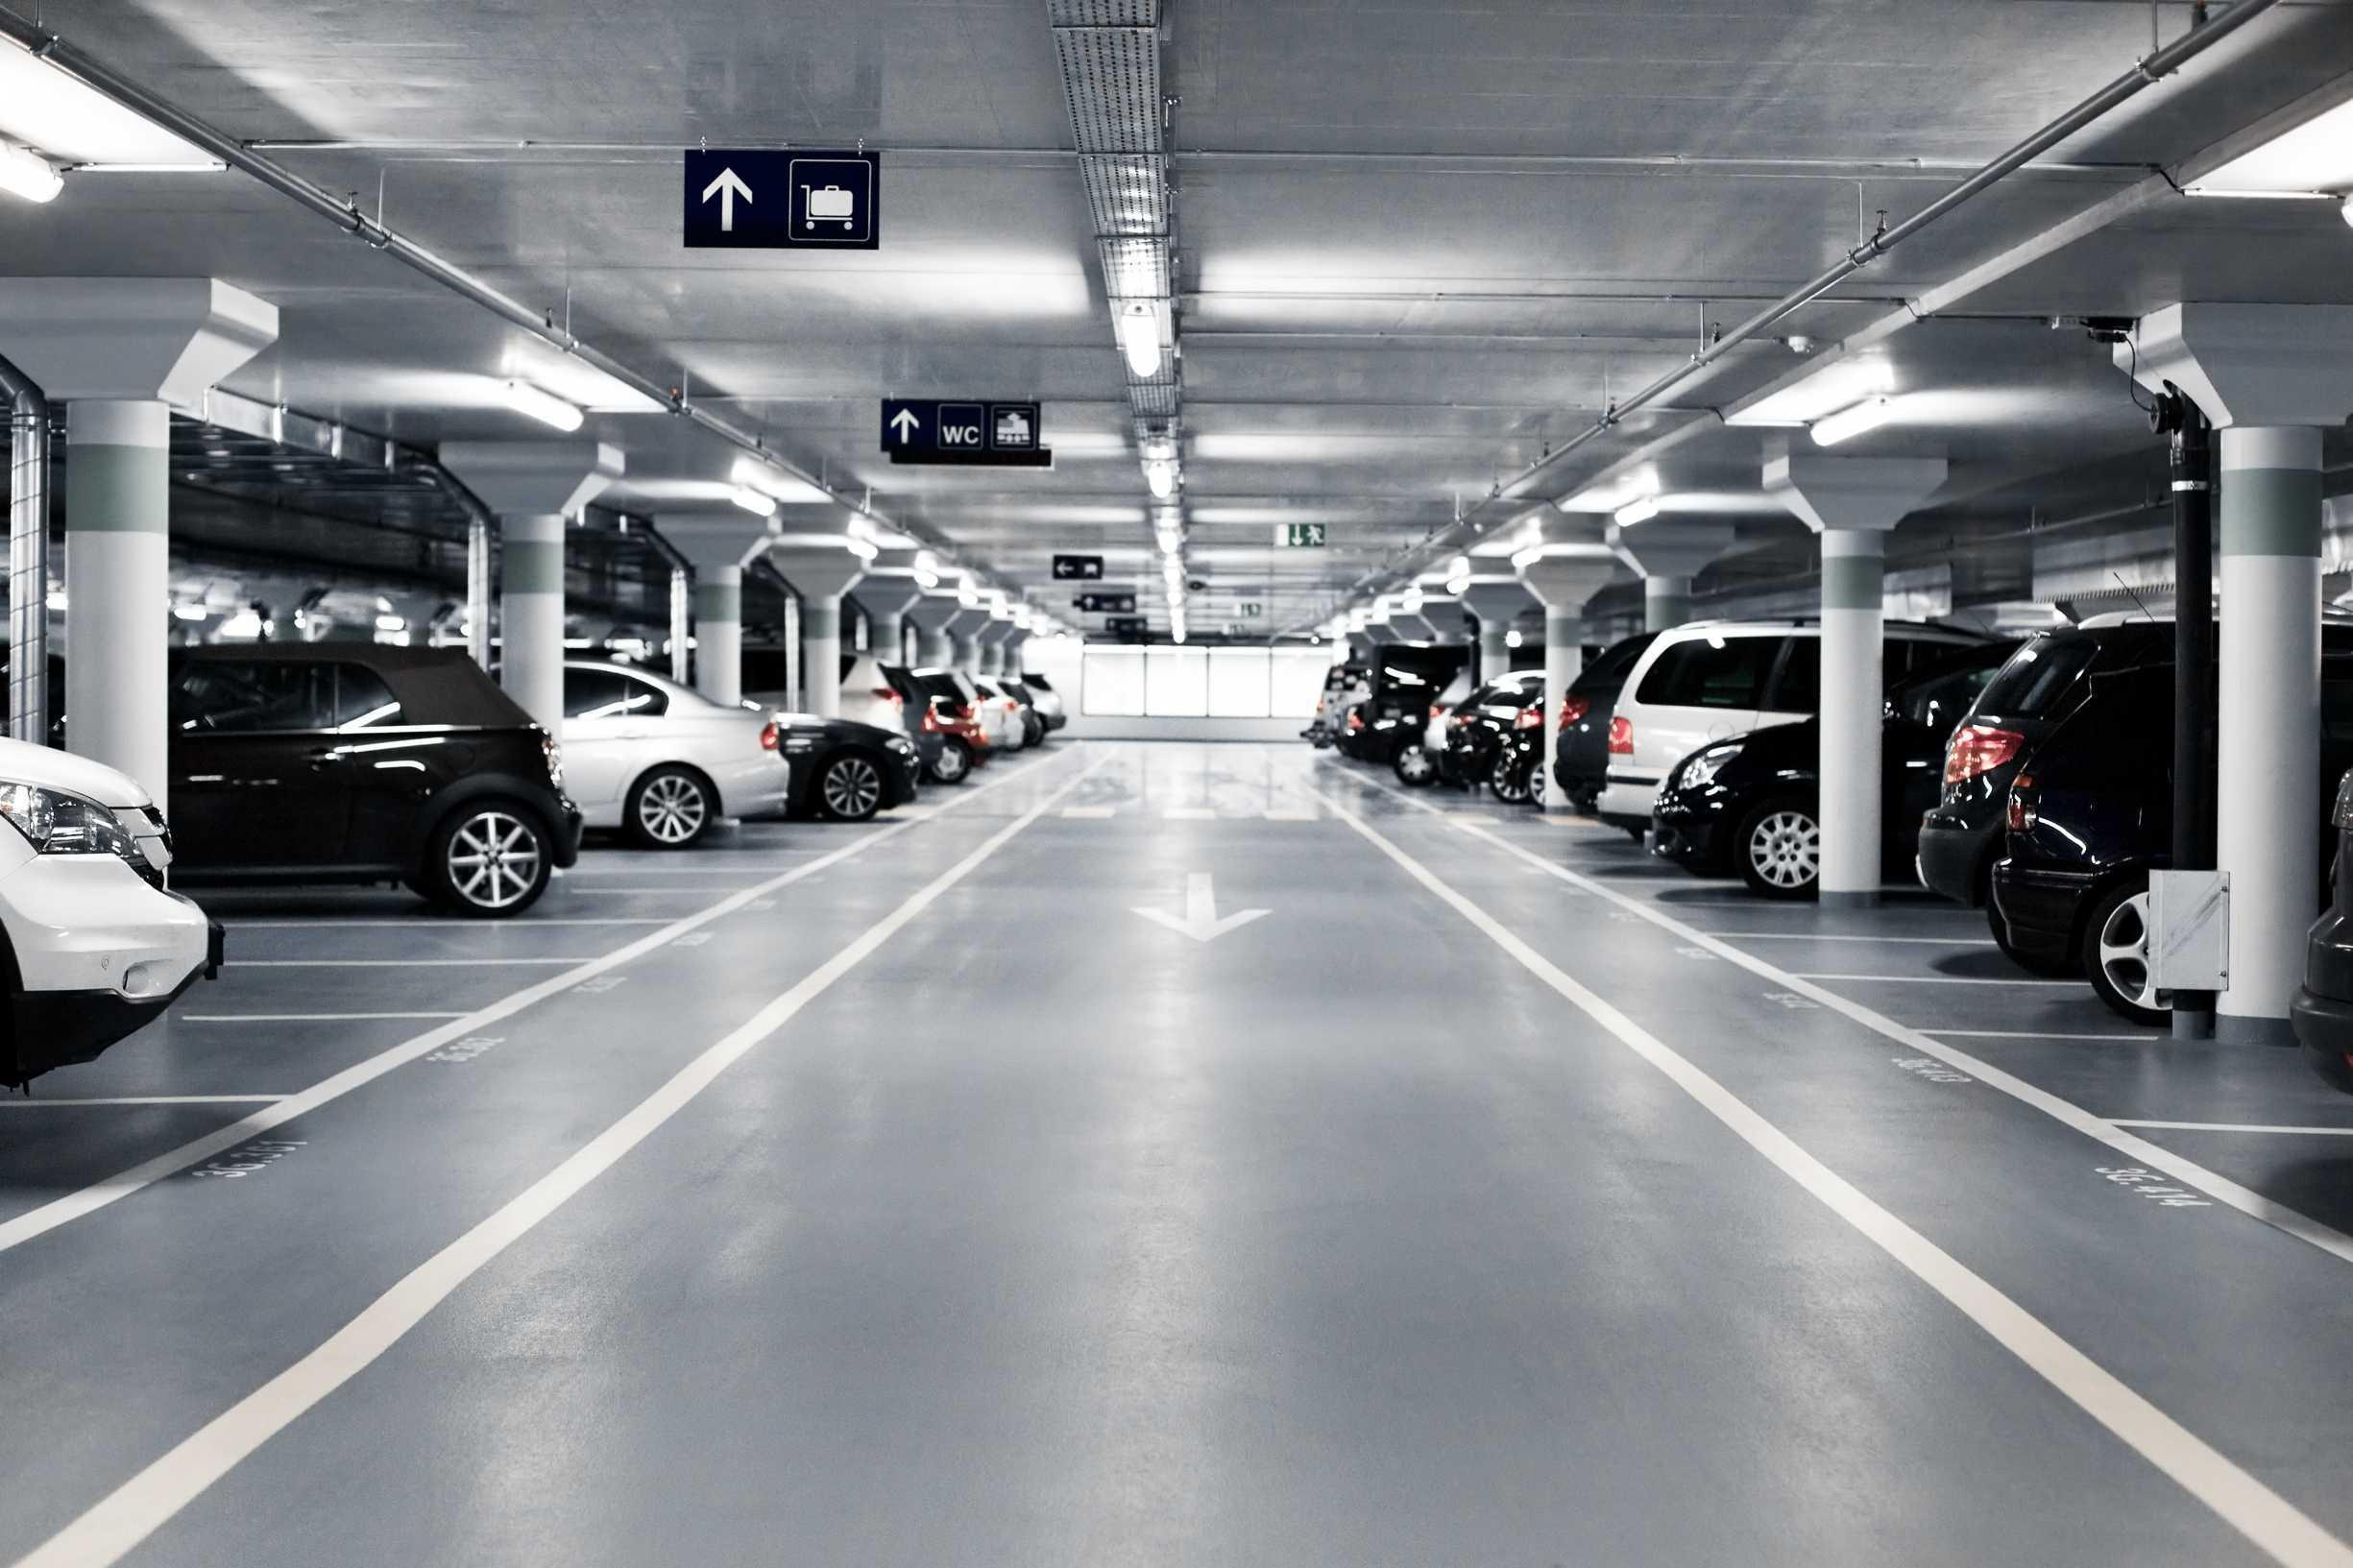 Vai deixar seu carro no estacionamento interno do Aeroporto de Guarulhos?